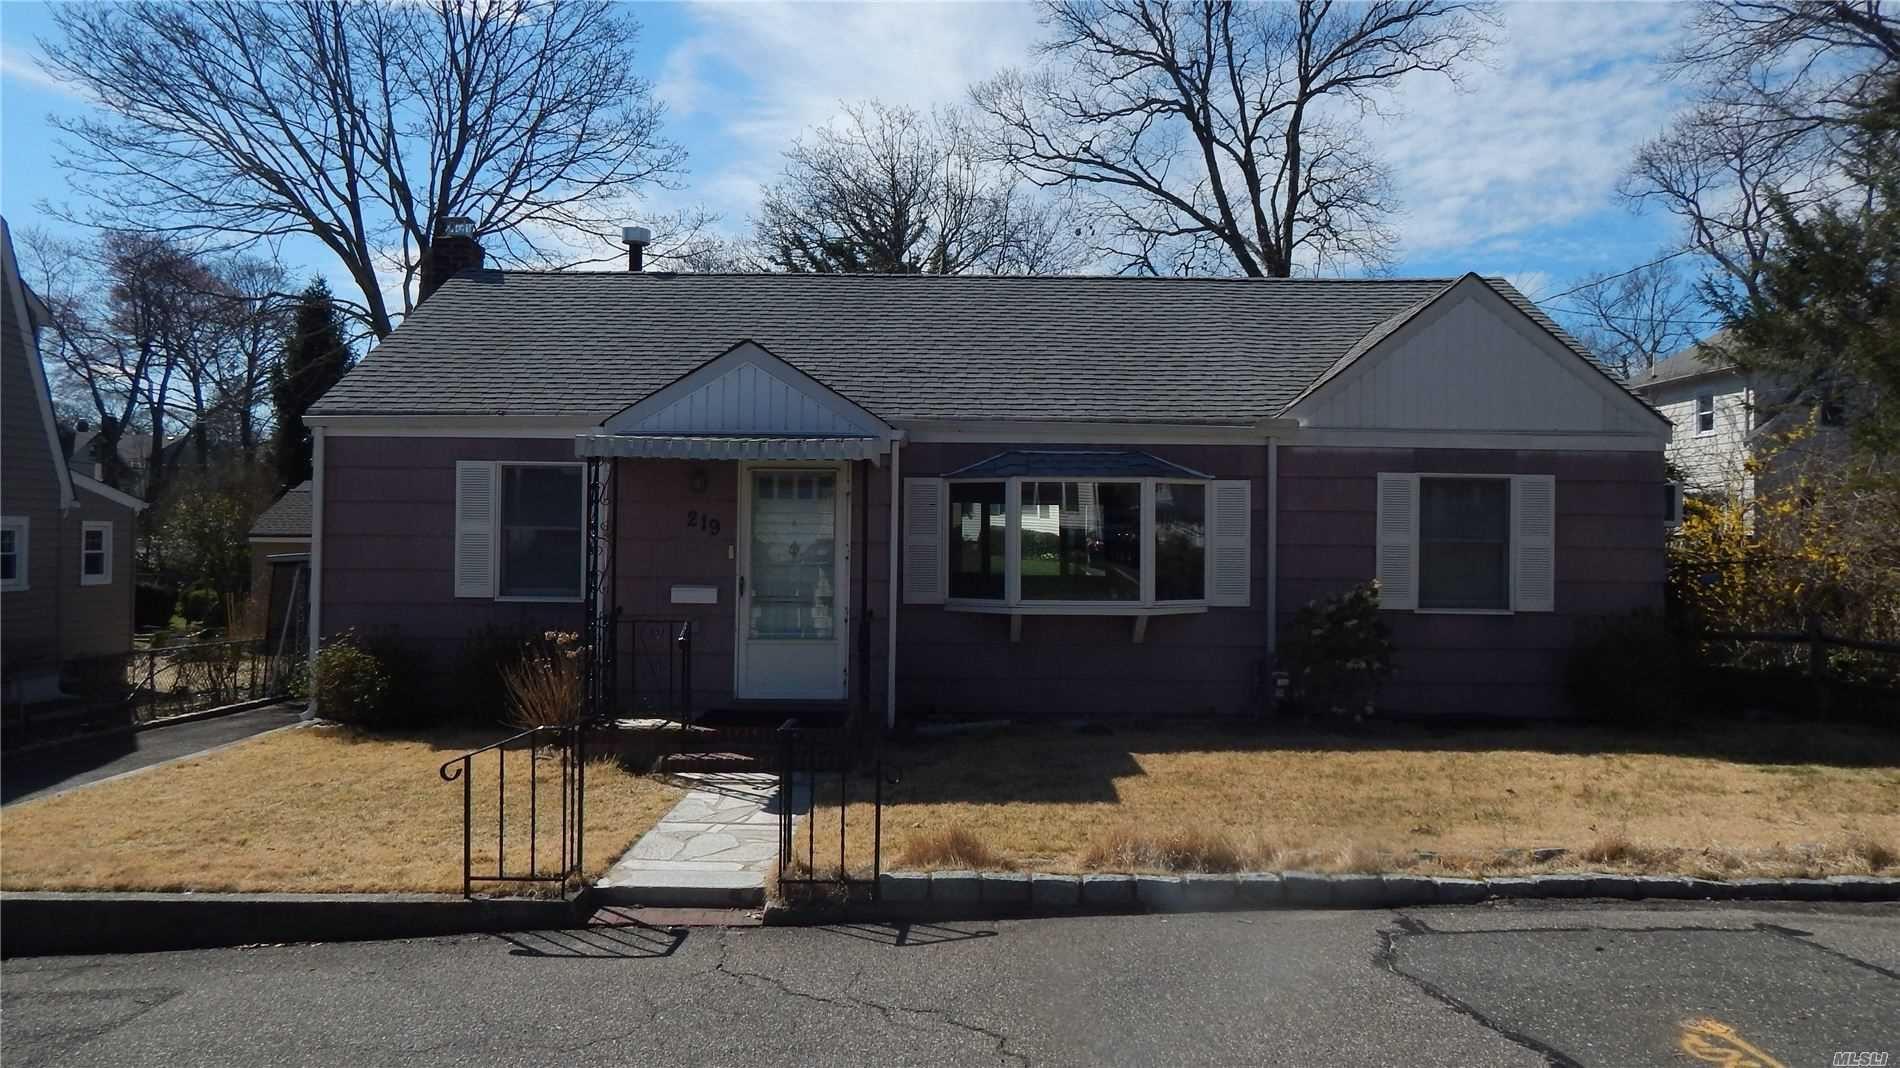 219 1st Street, East Northport, NY 11731 - MLS#: 3210004